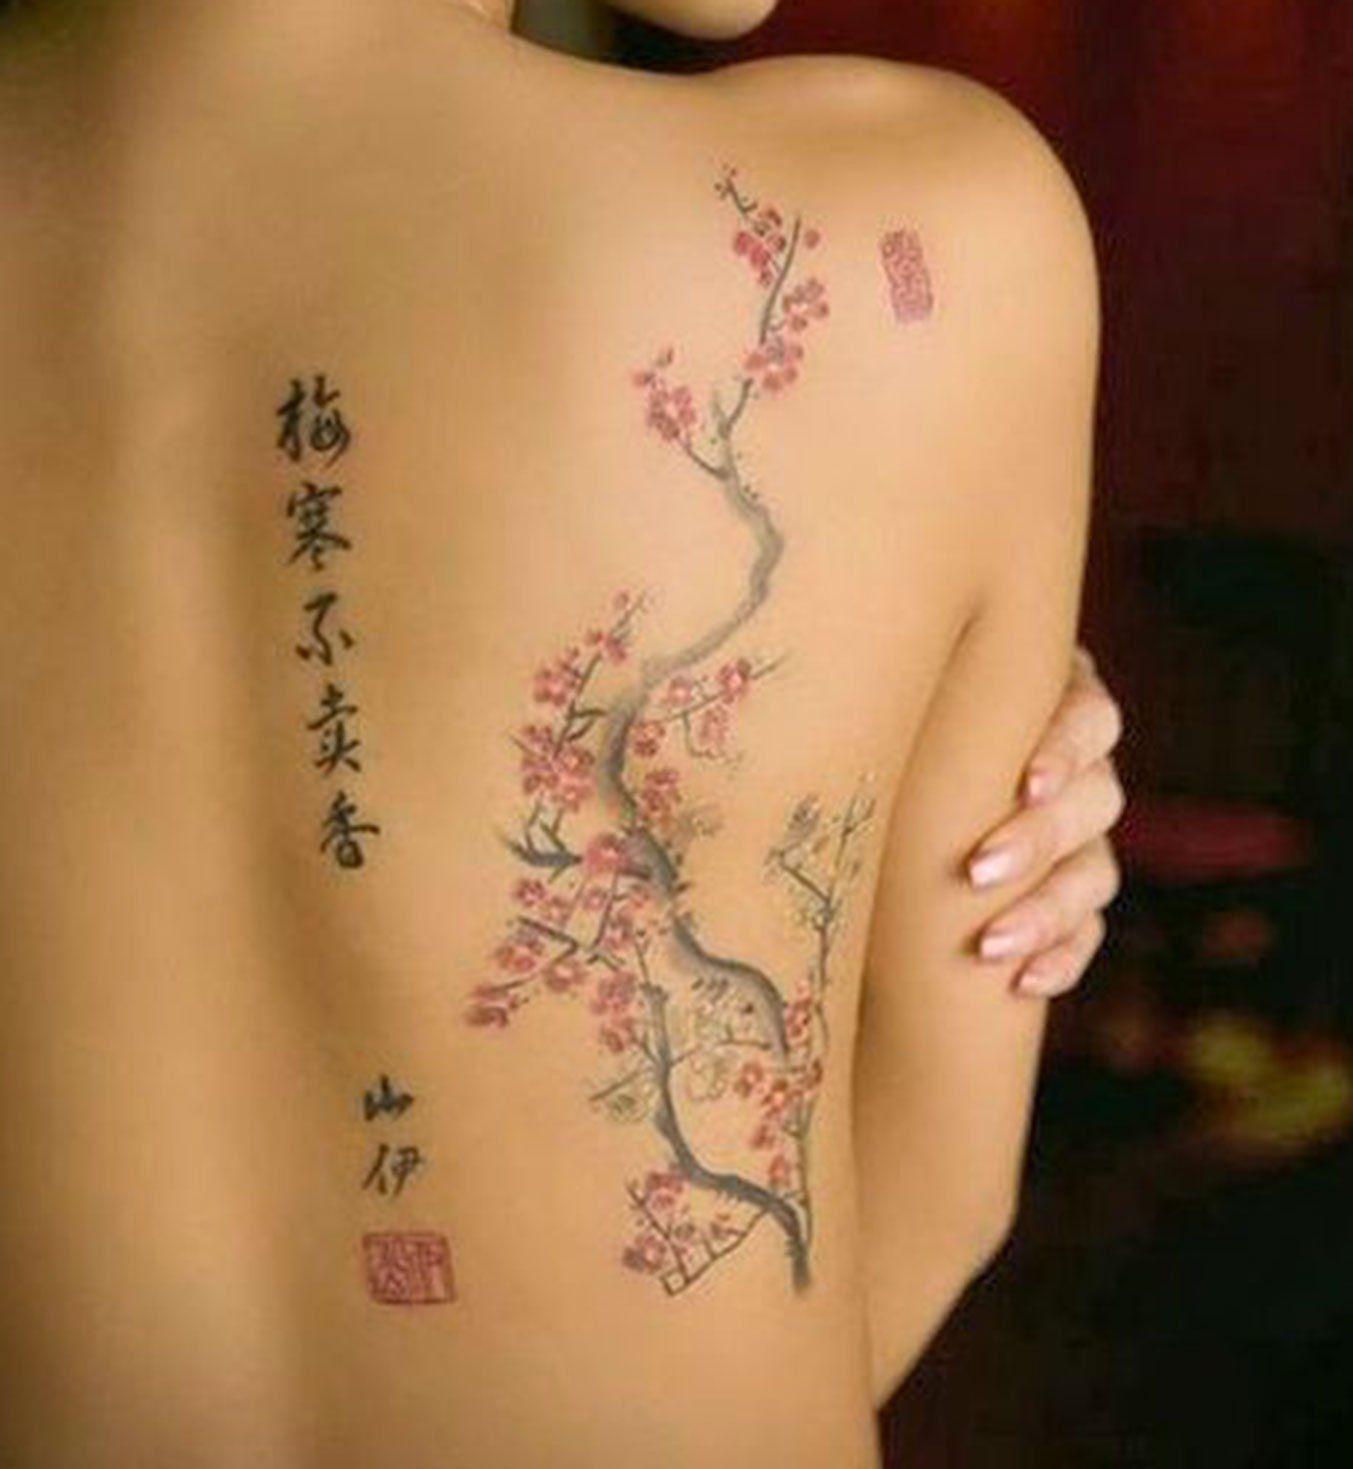 un tatouage de branche de cerisier tattoos tatouage. Black Bedroom Furniture Sets. Home Design Ideas